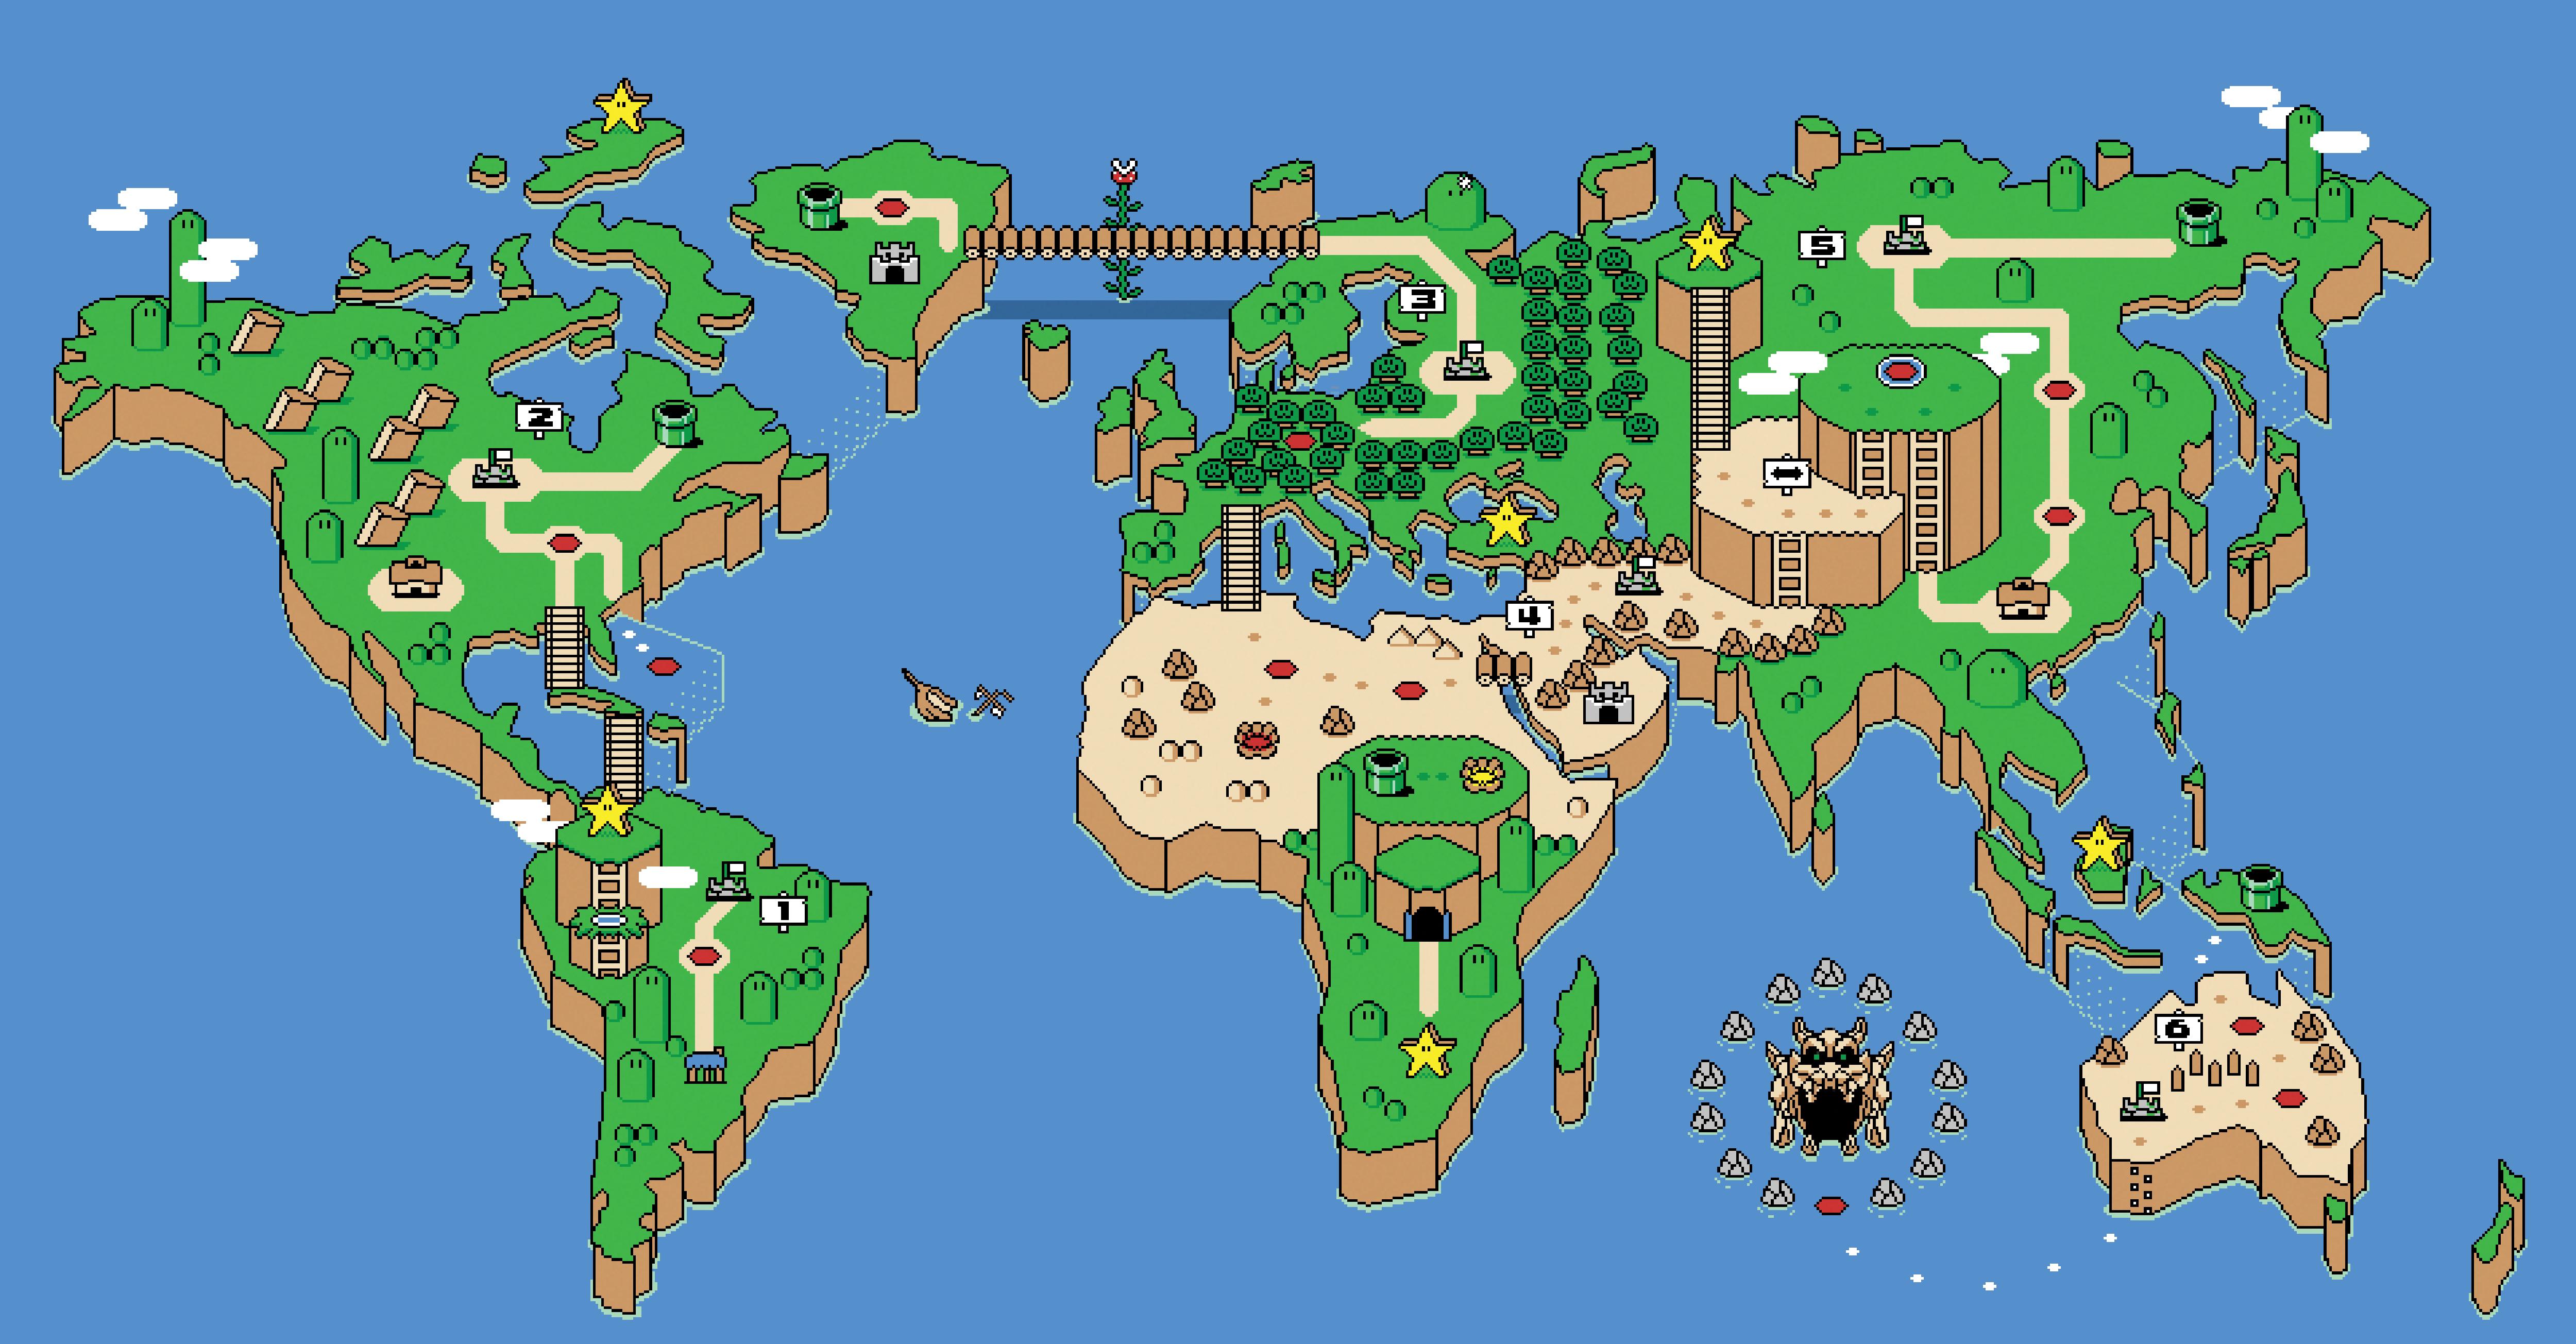 Super Mario world map 可愛い Pinterest